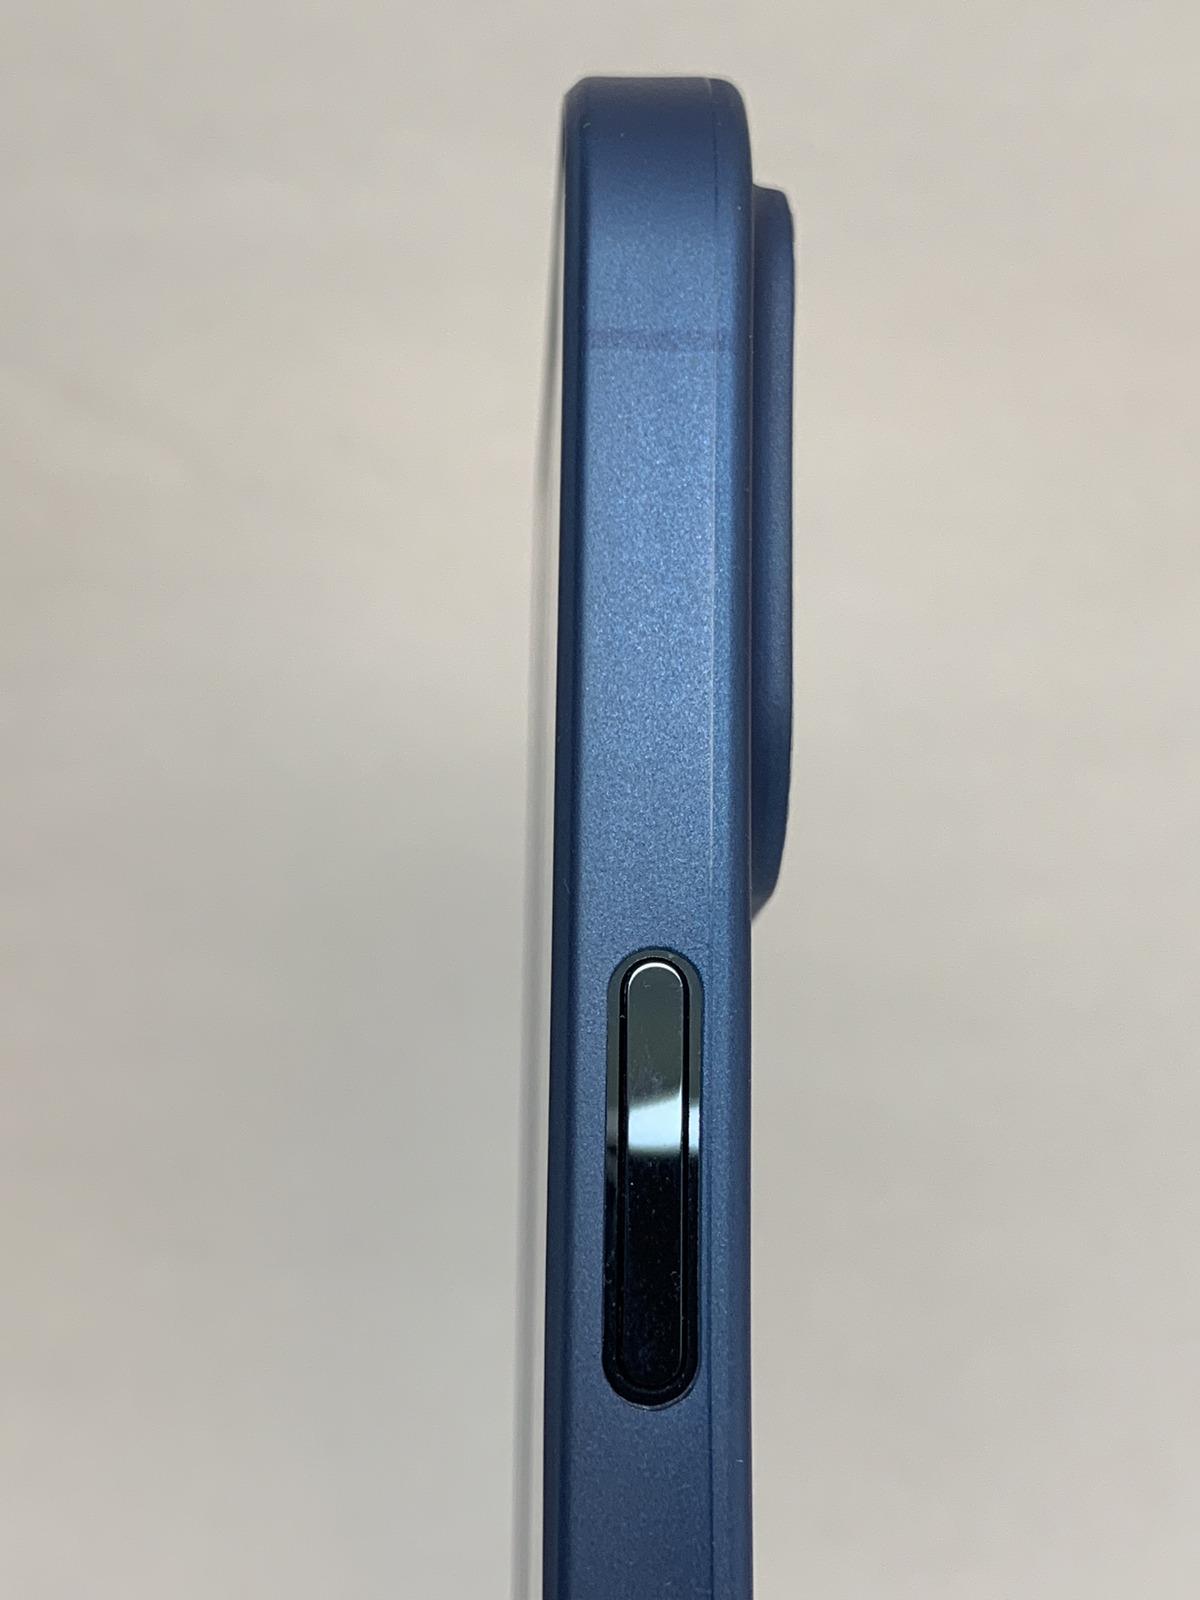 iphone12-case-10-photo-026